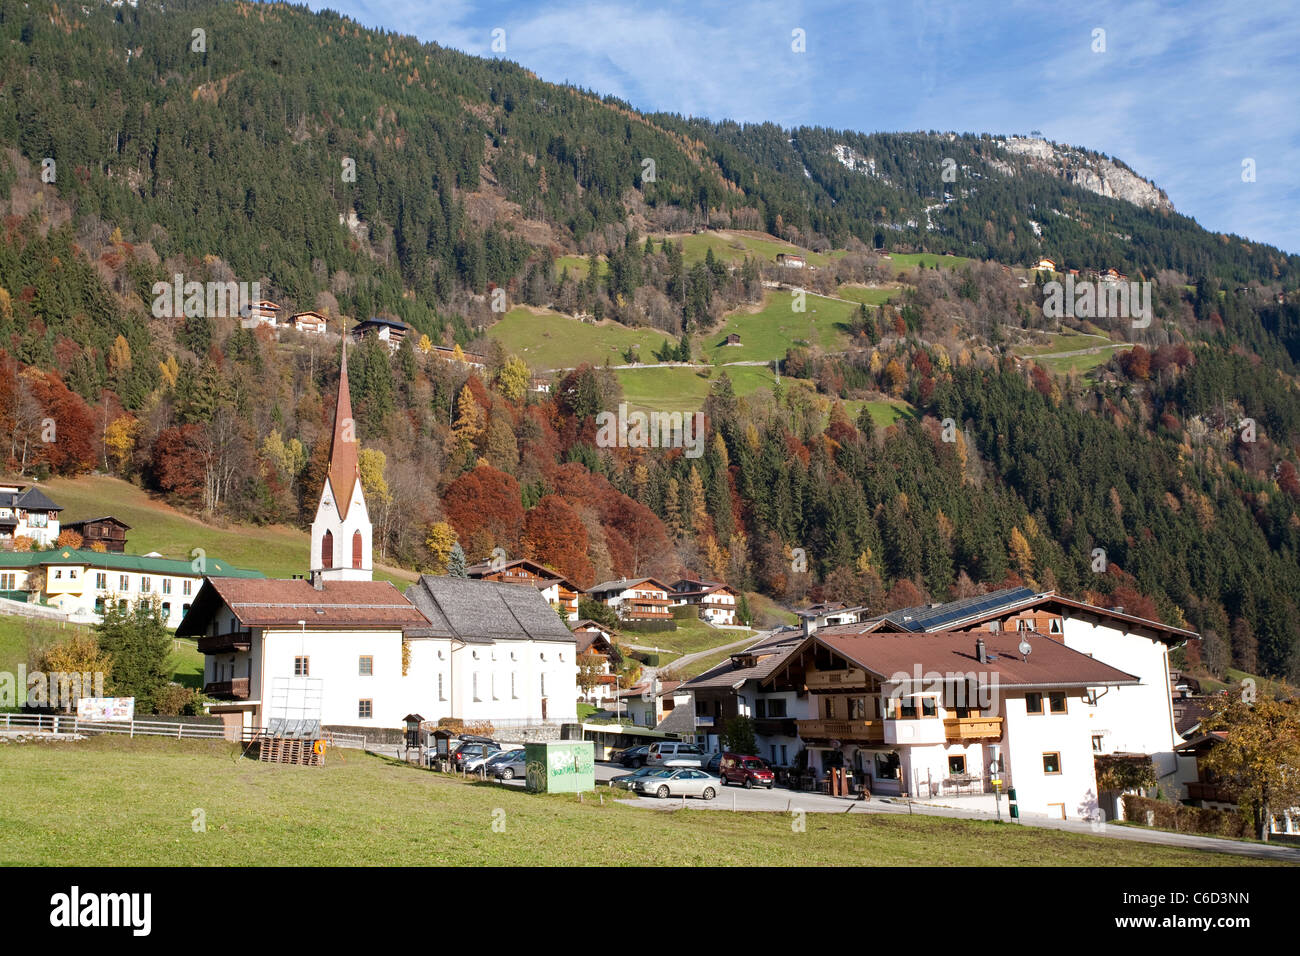 Kirche in Finkenberg, Zillertal, Tirol, Österreich, Europa Stockbild